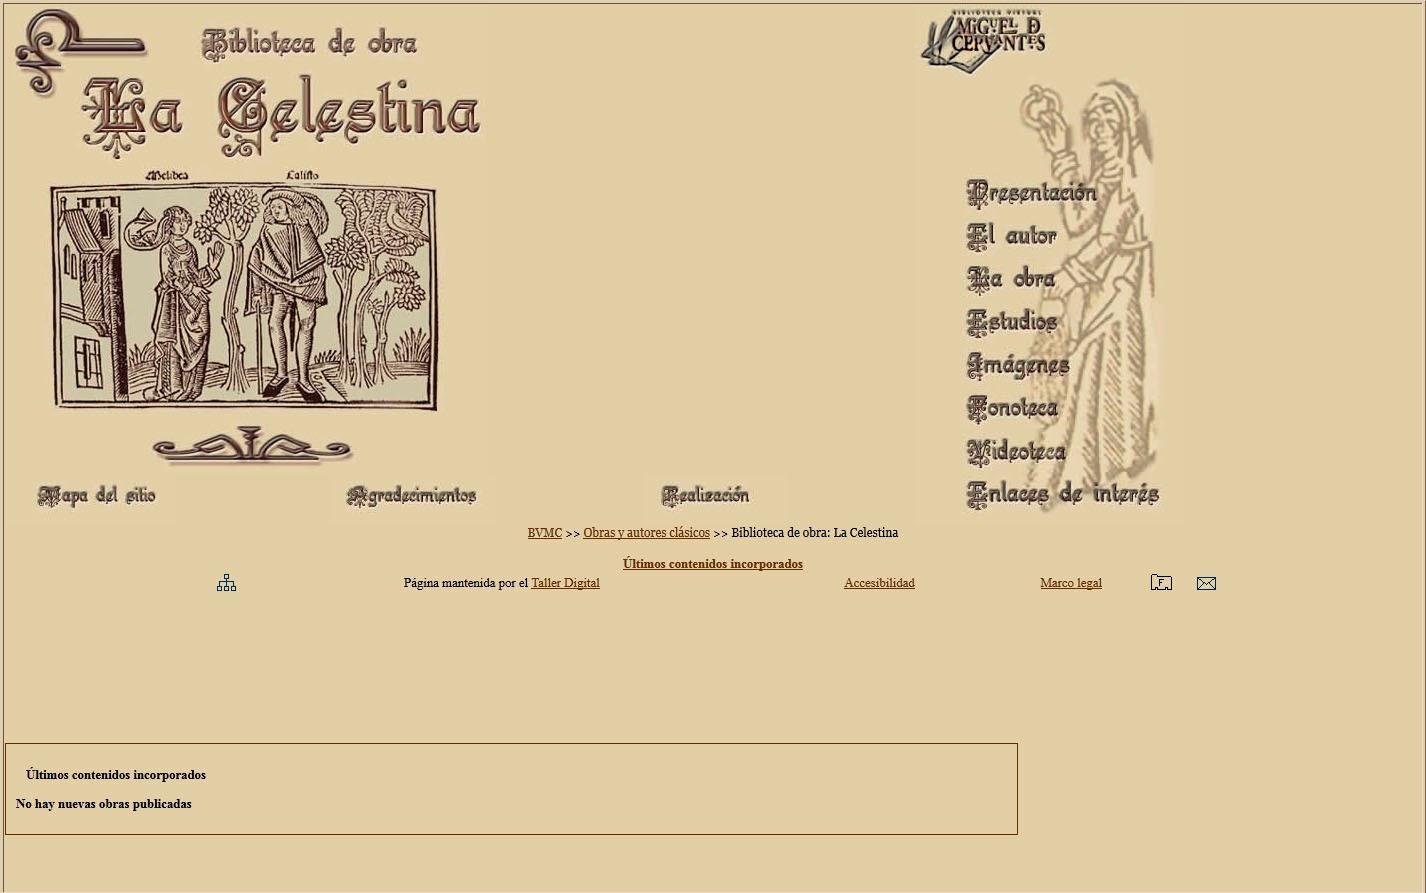 http://www.cervantesvirtual.com/bib/bib_obra/celestina/